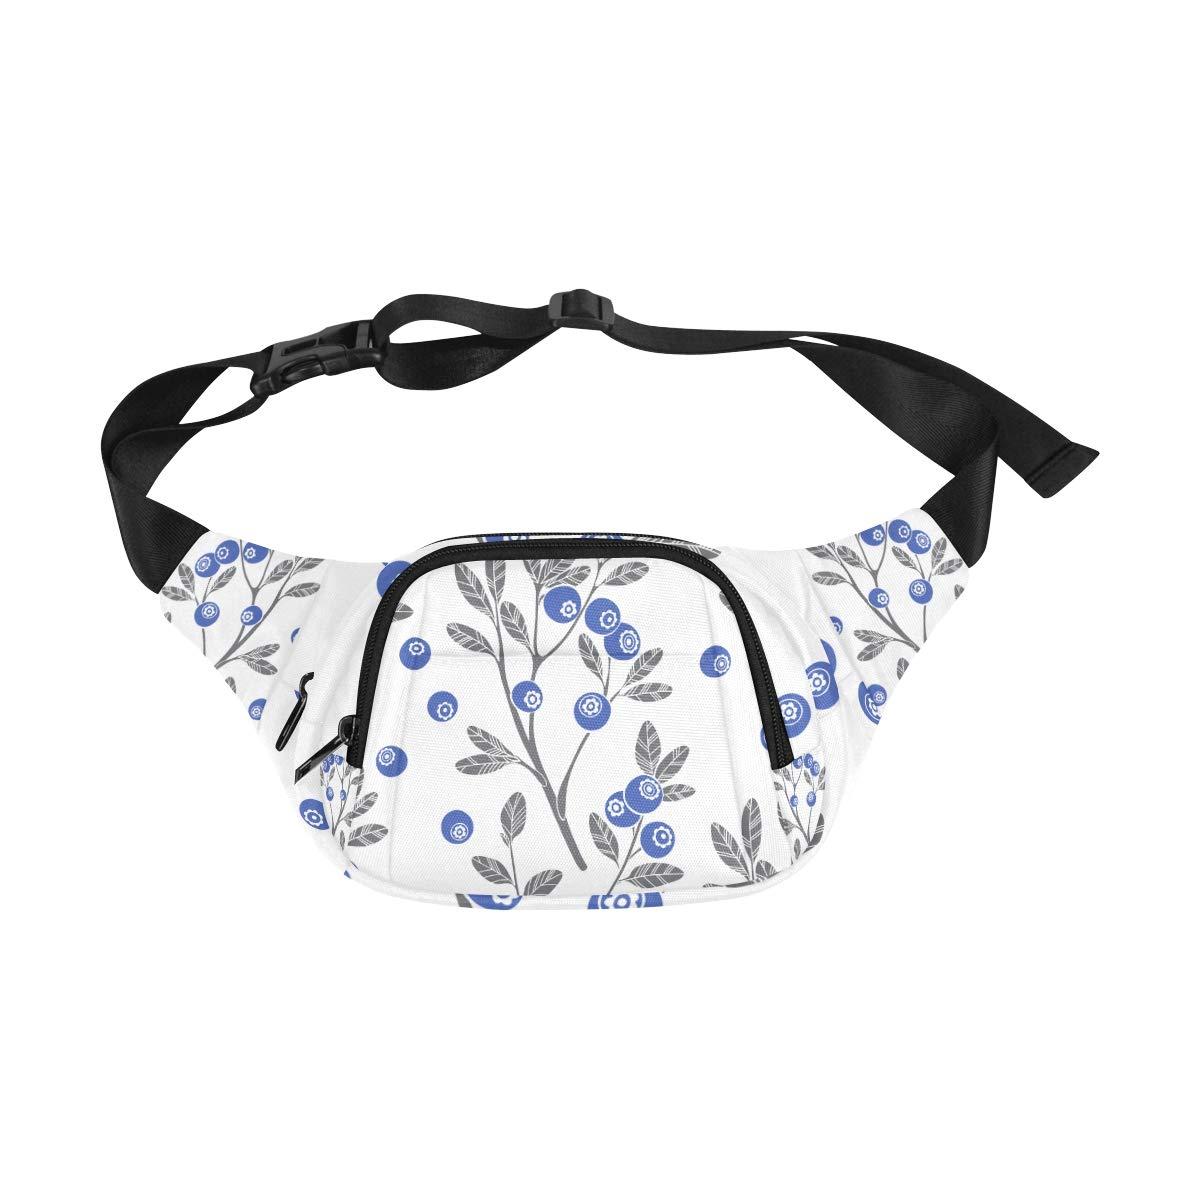 Delicious Blueberry Fruit Fenny Packs Waist Bags Adjustable Belt Waterproof Nylon Travel Running Sport Vacation Party For Men Women Boys Girls Kids